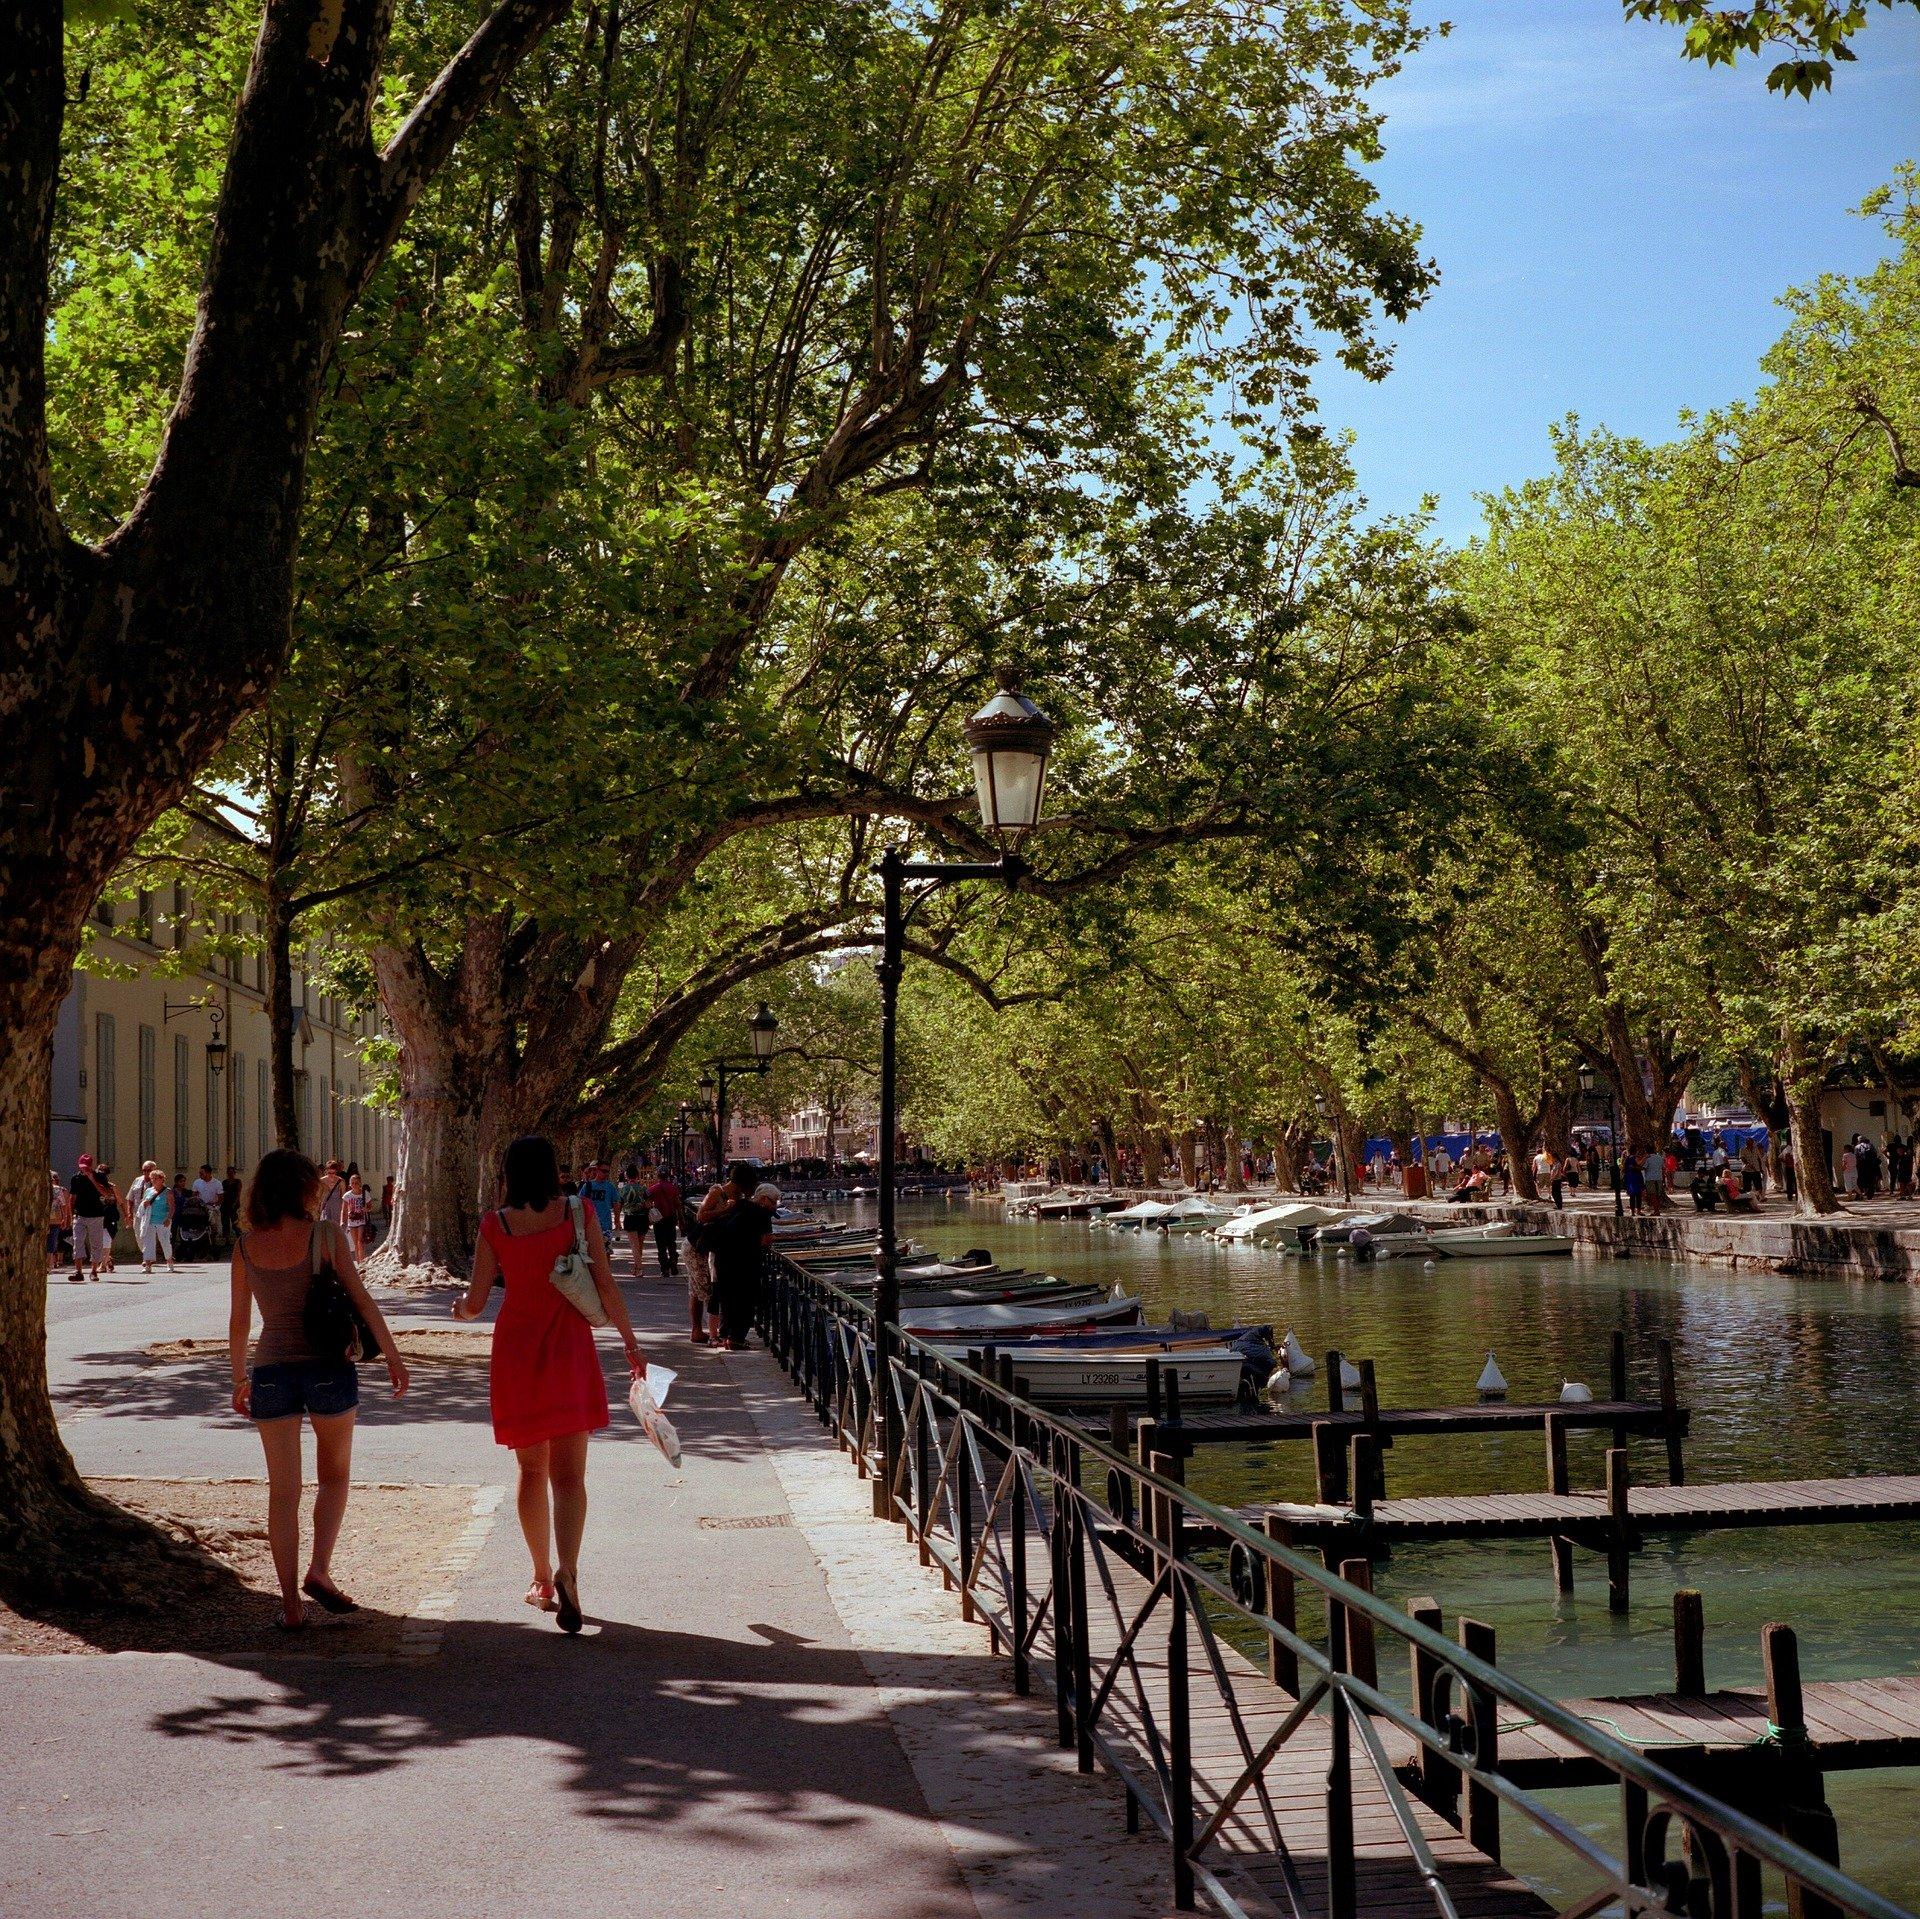 Grand Genève en France voisine, Annecy ballade